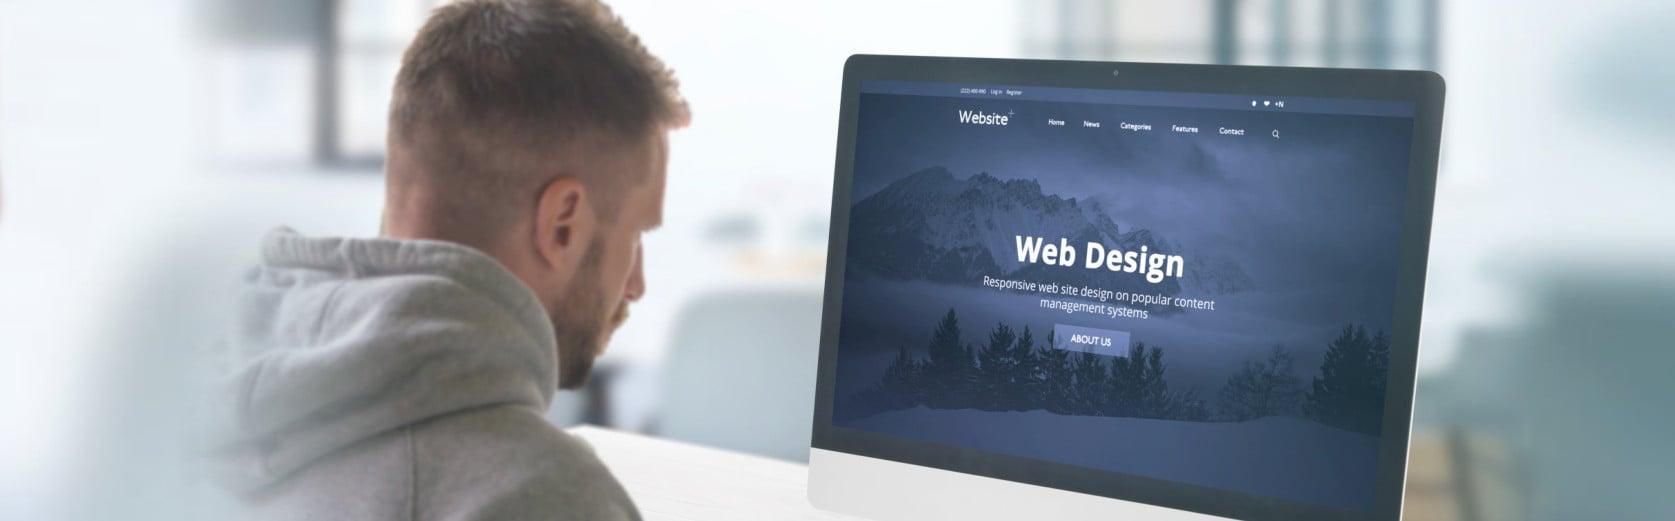 web-design-trends-2022